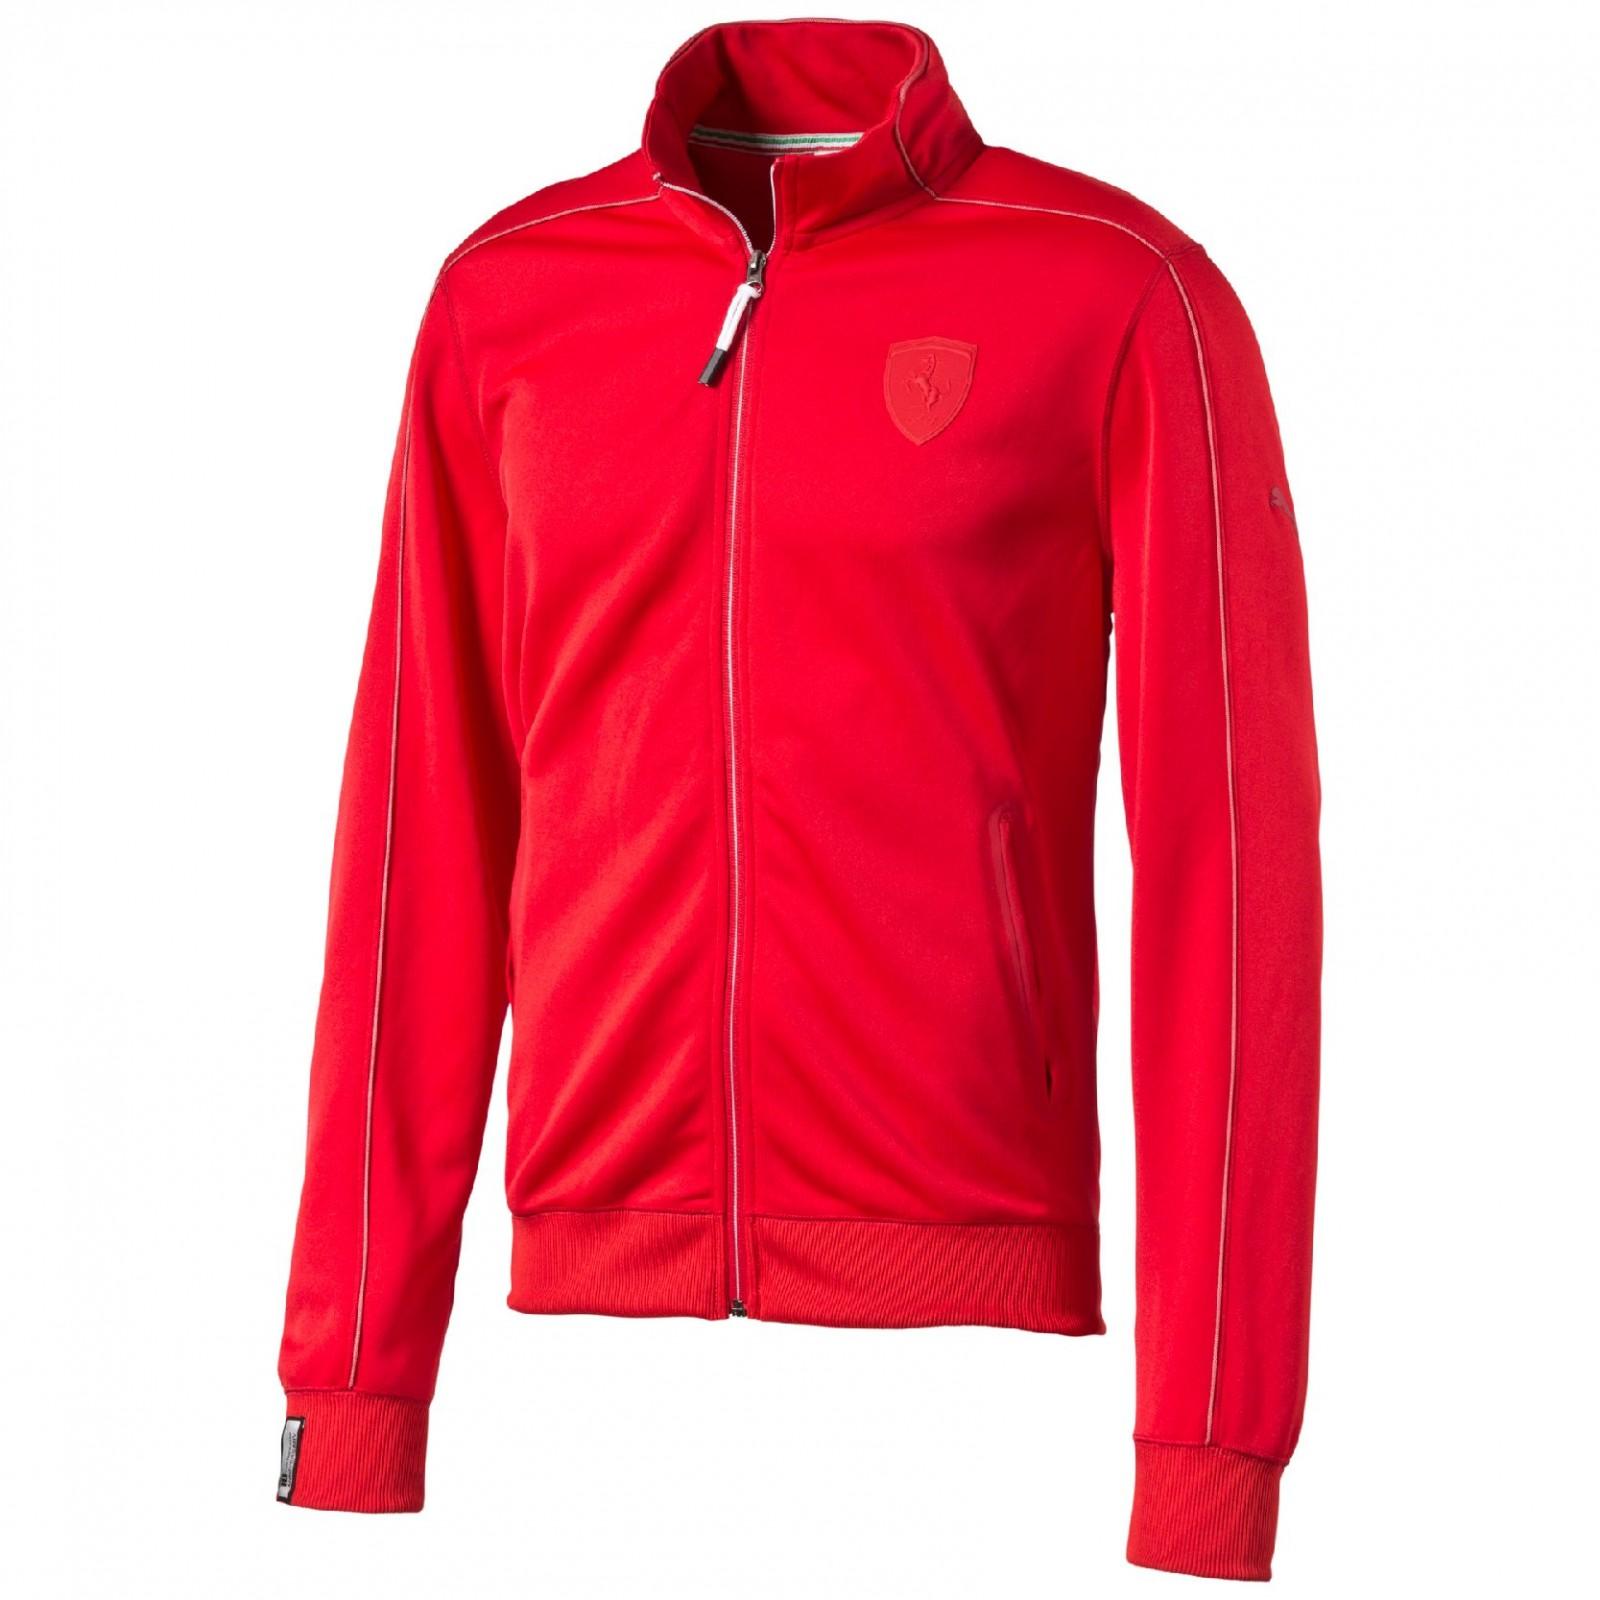 7ffd5cbb12 Pánská mikina Puma Ferrari Ferrari Track Jacket rosso cor